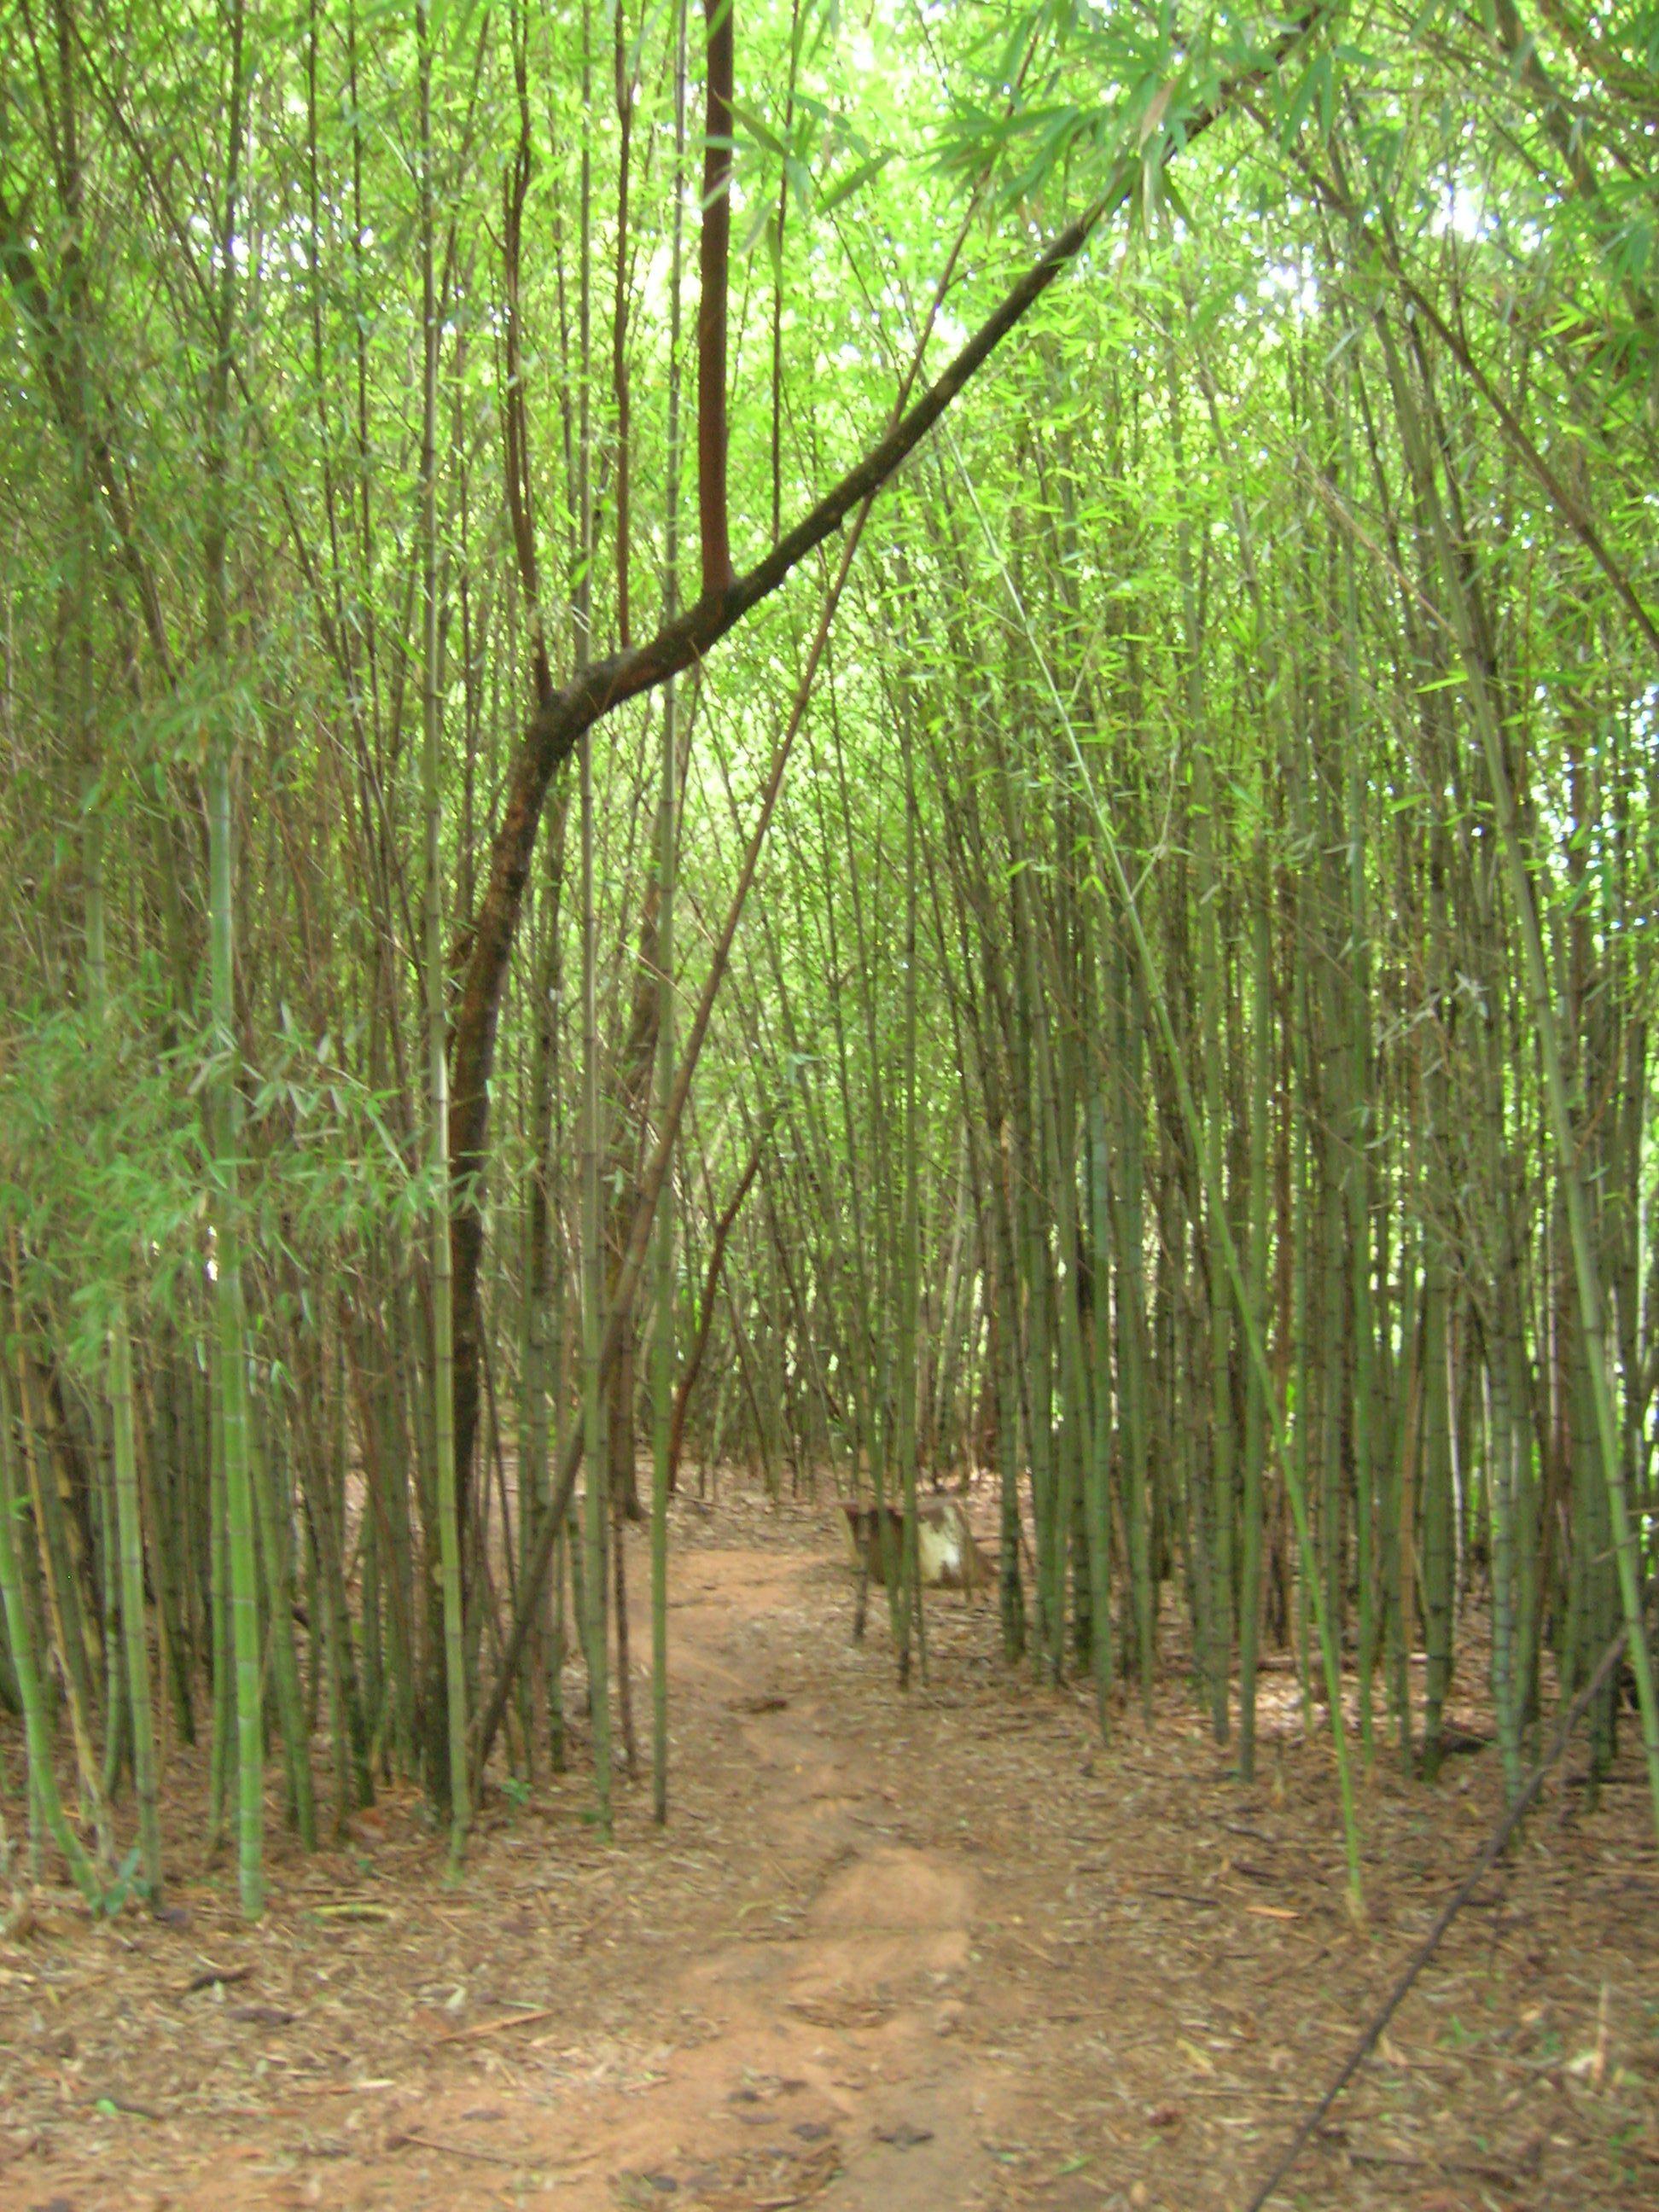 fotos jardim botanico porto alegre : fotos jardim botanico porto alegre:File:Bambus jardim botânico porto alegre.JPG – Wikimedia Commons